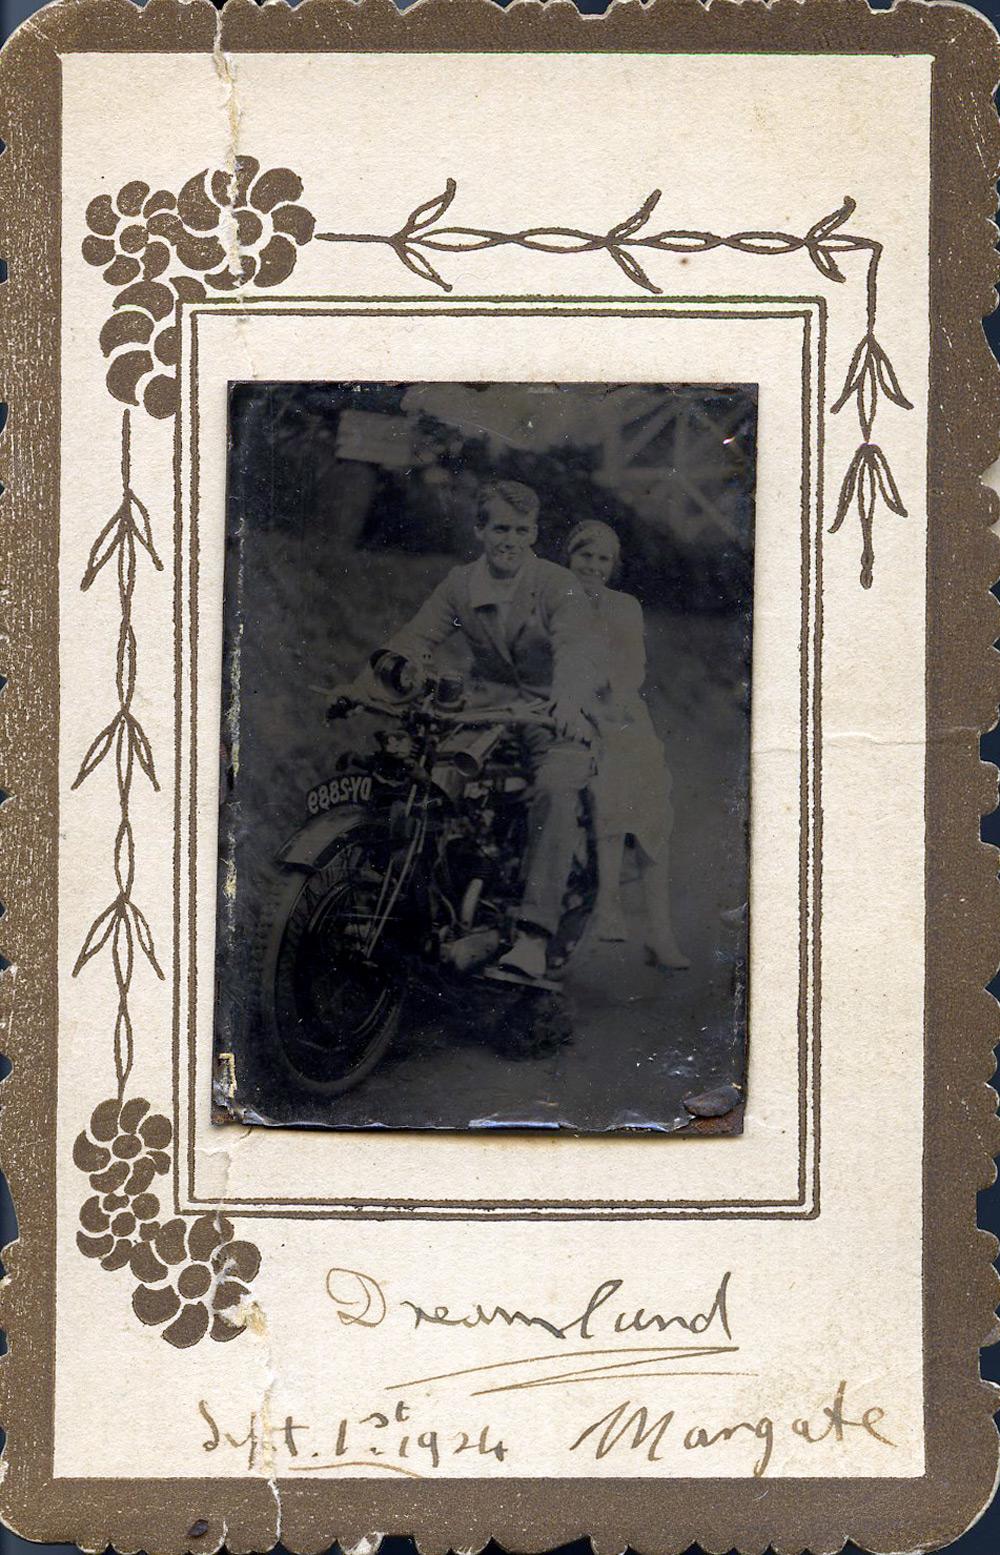 Original Tintype, Dreamland Margate, Sept 1st, 1924